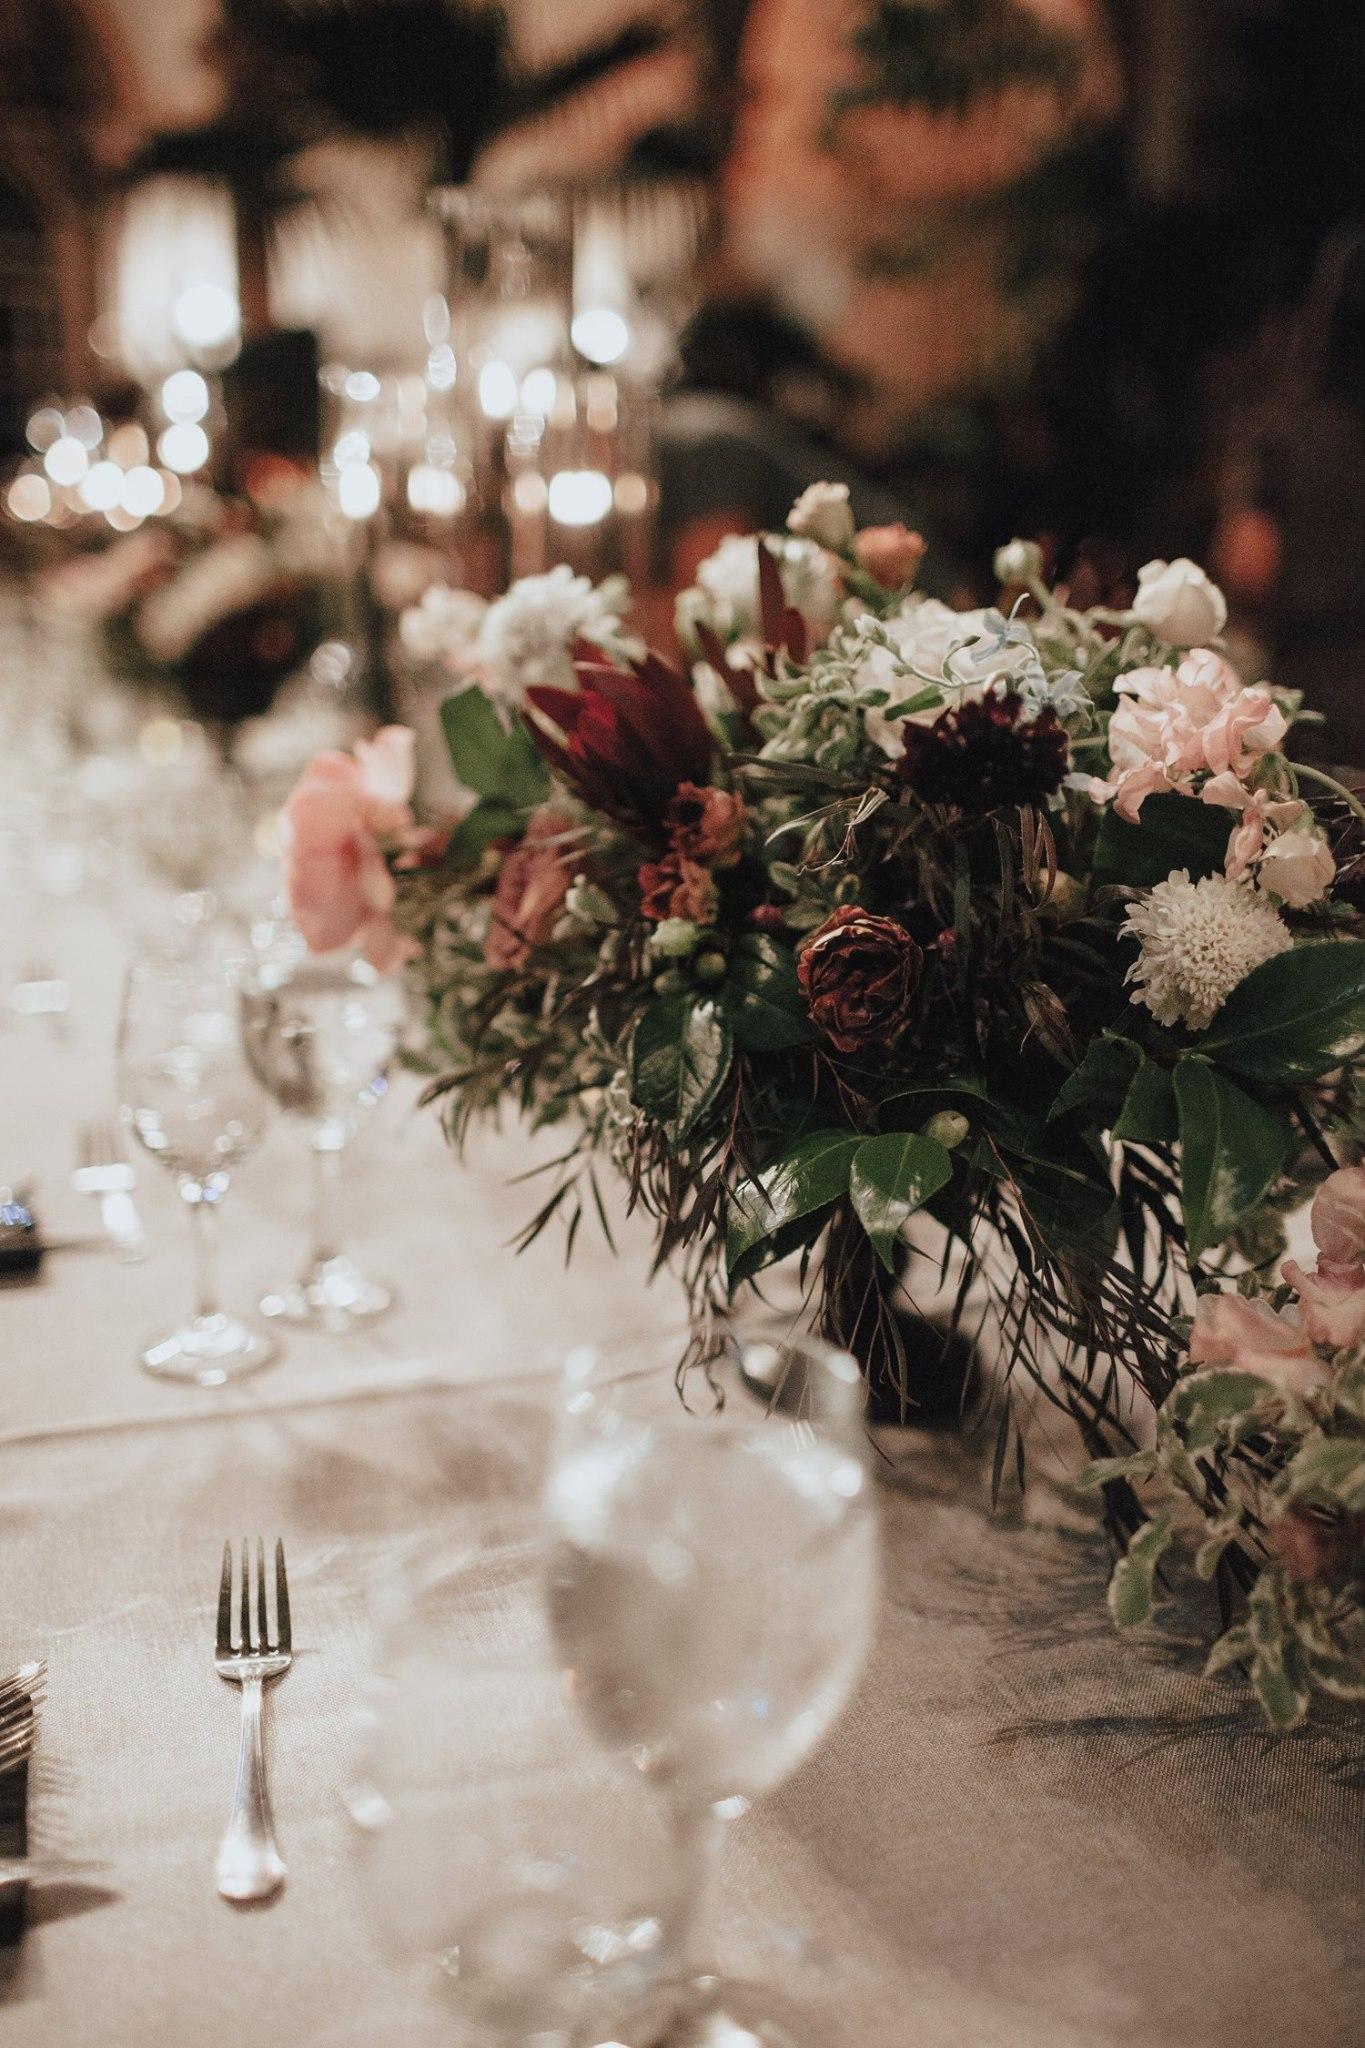 Catering Luxury Destination Wedding in Miami 31.jpg